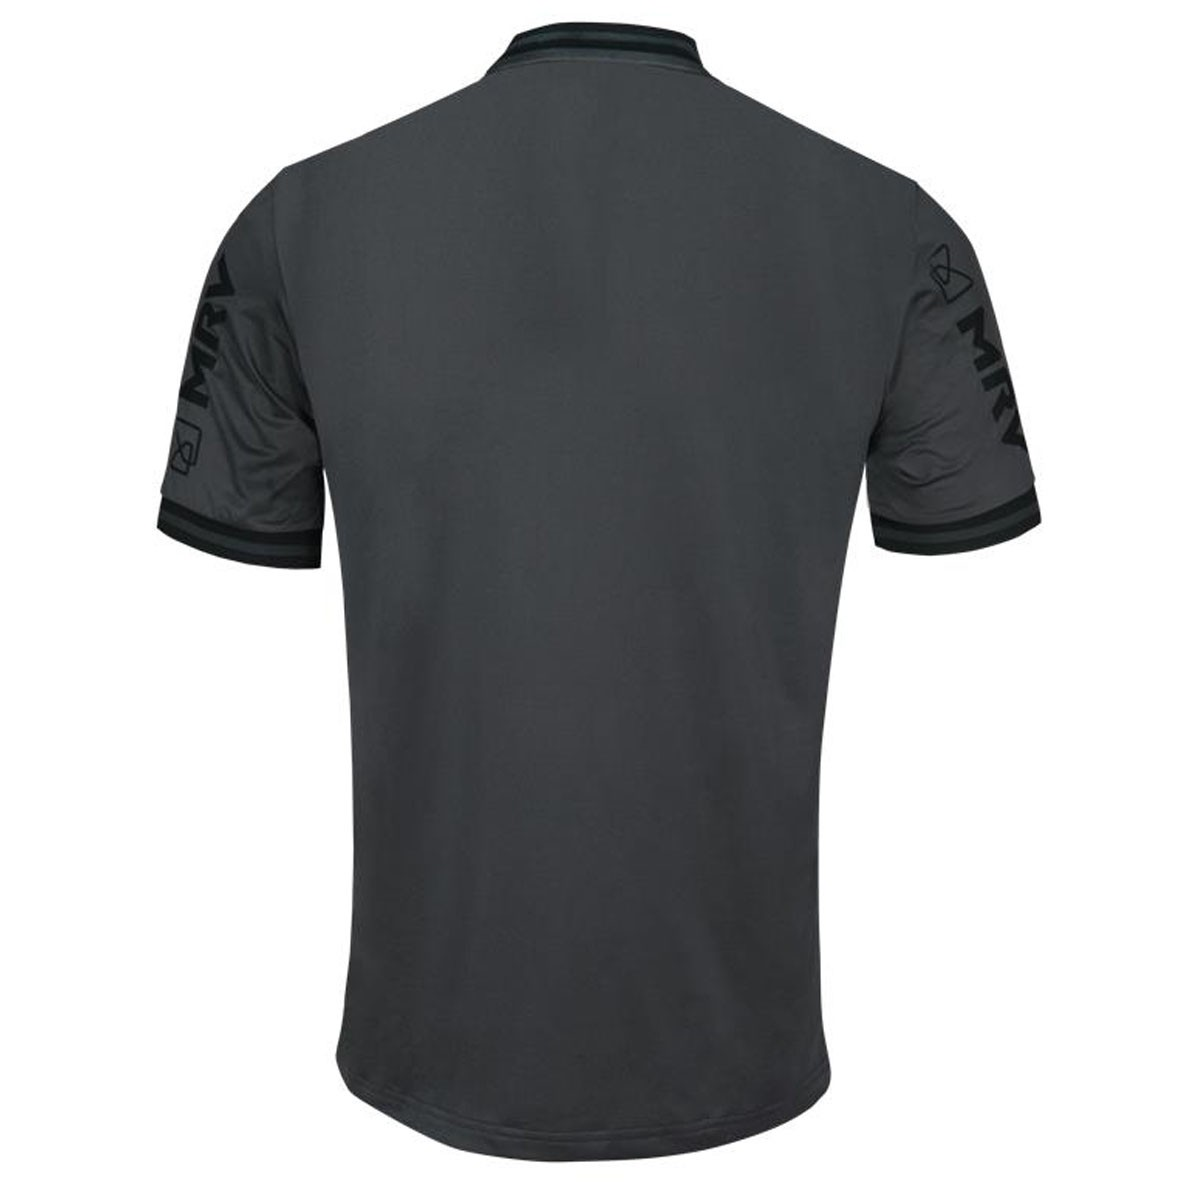 Camisa Le Coq Sportif Atlético Mineiro III 2020